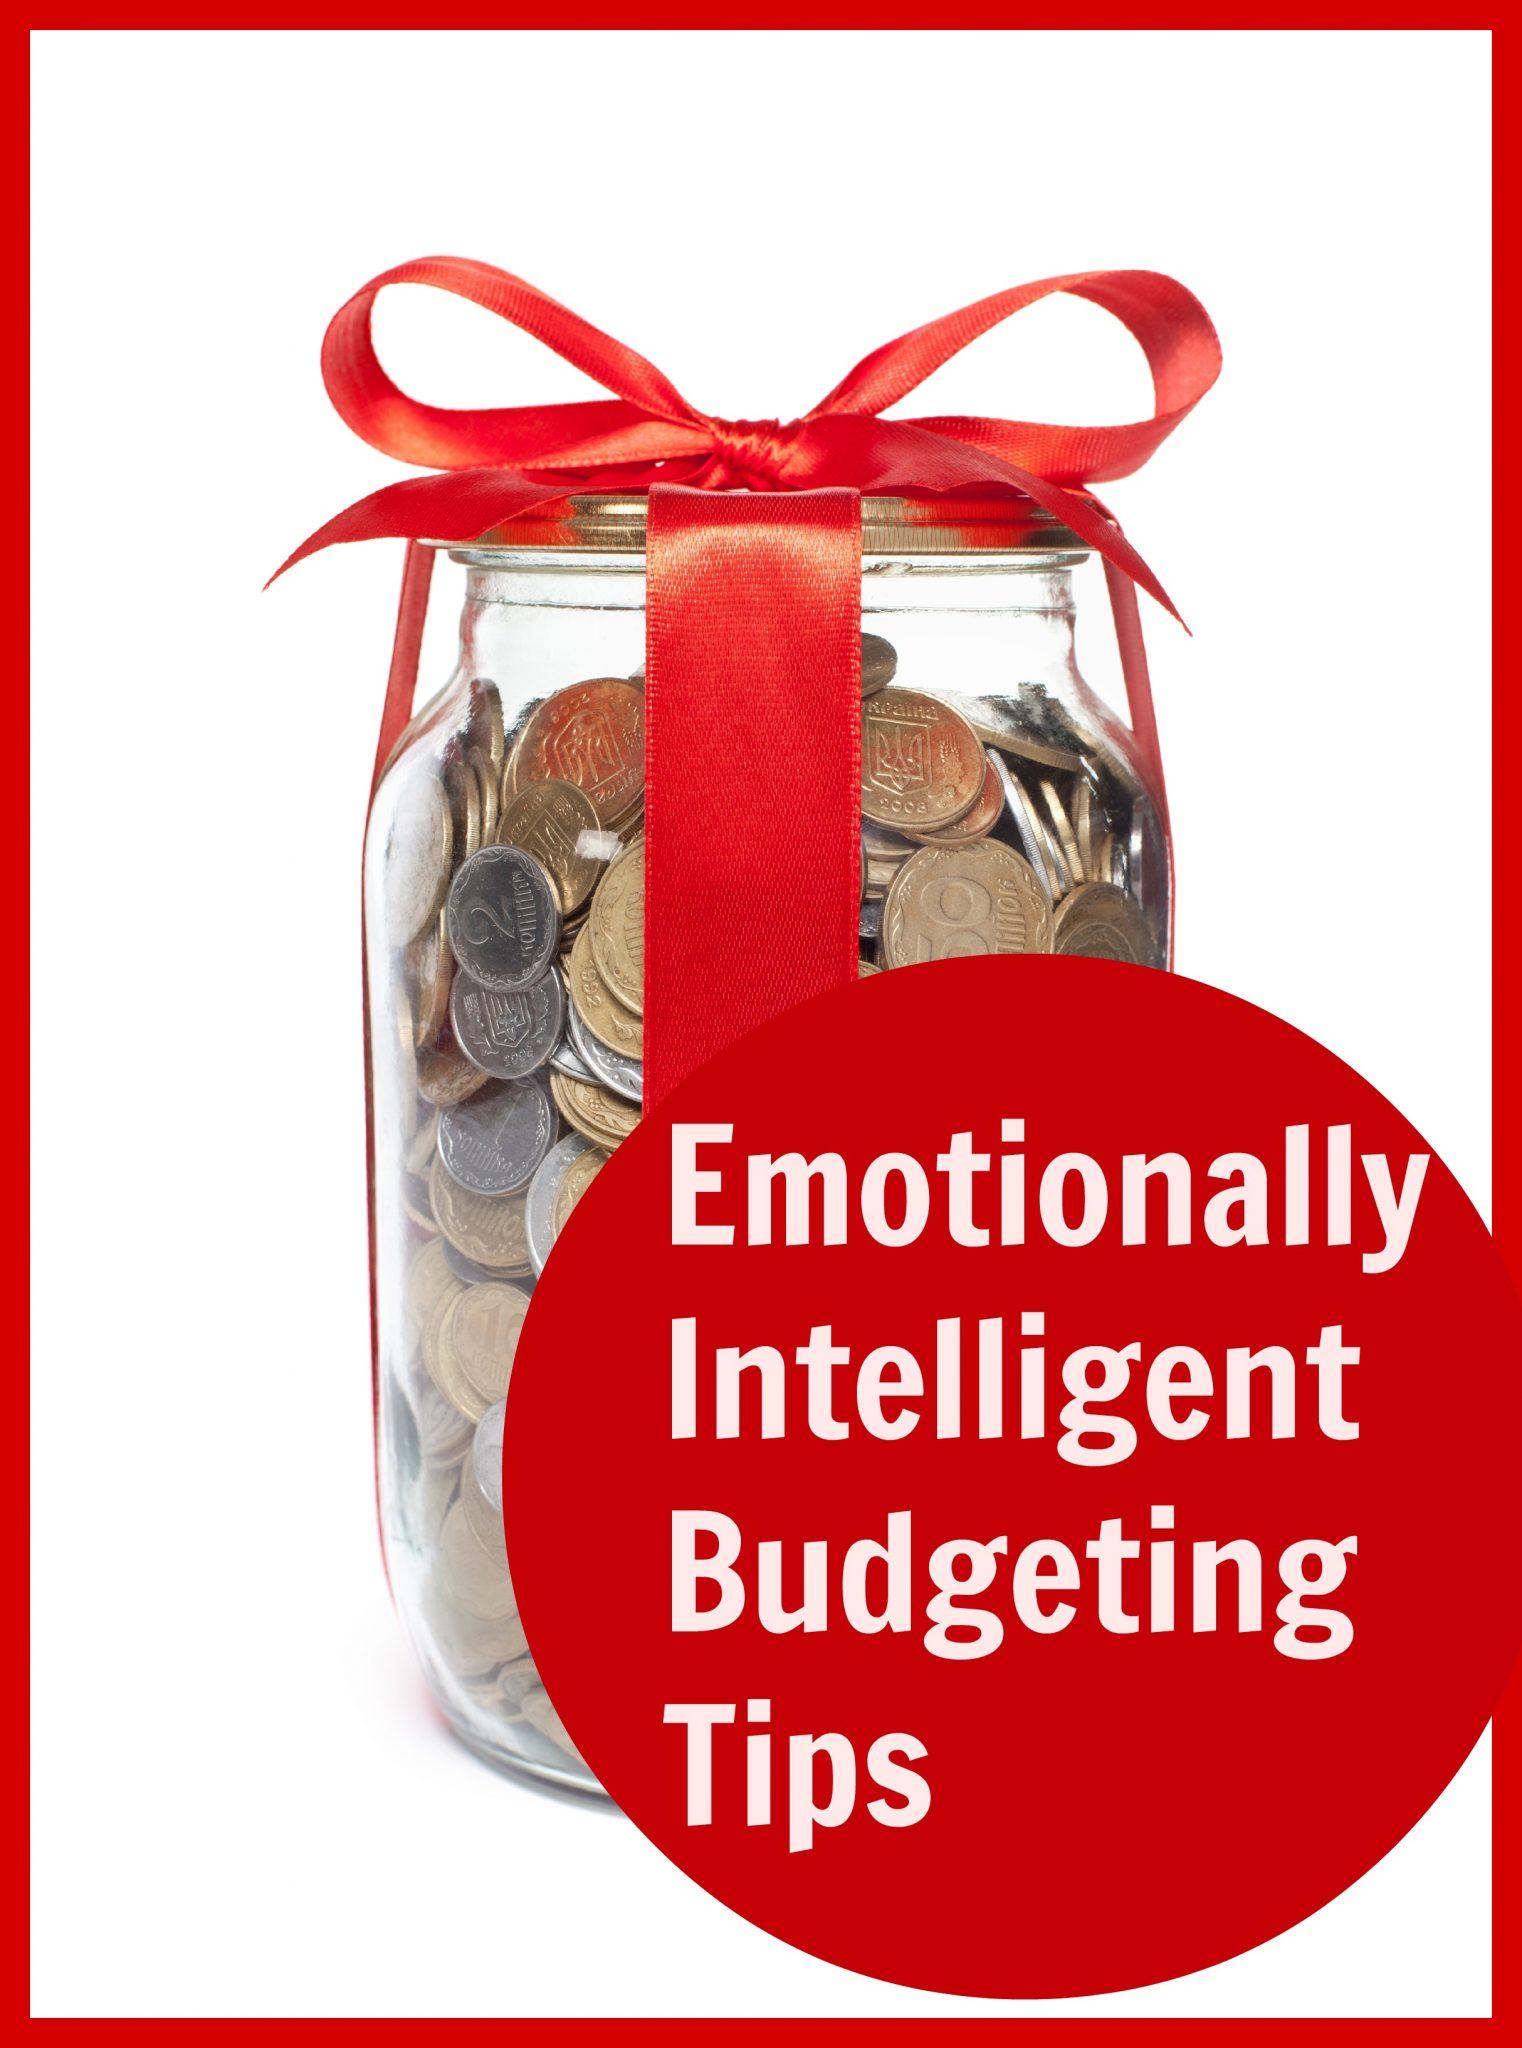 Emotionally Intelligent Budgeting Tips